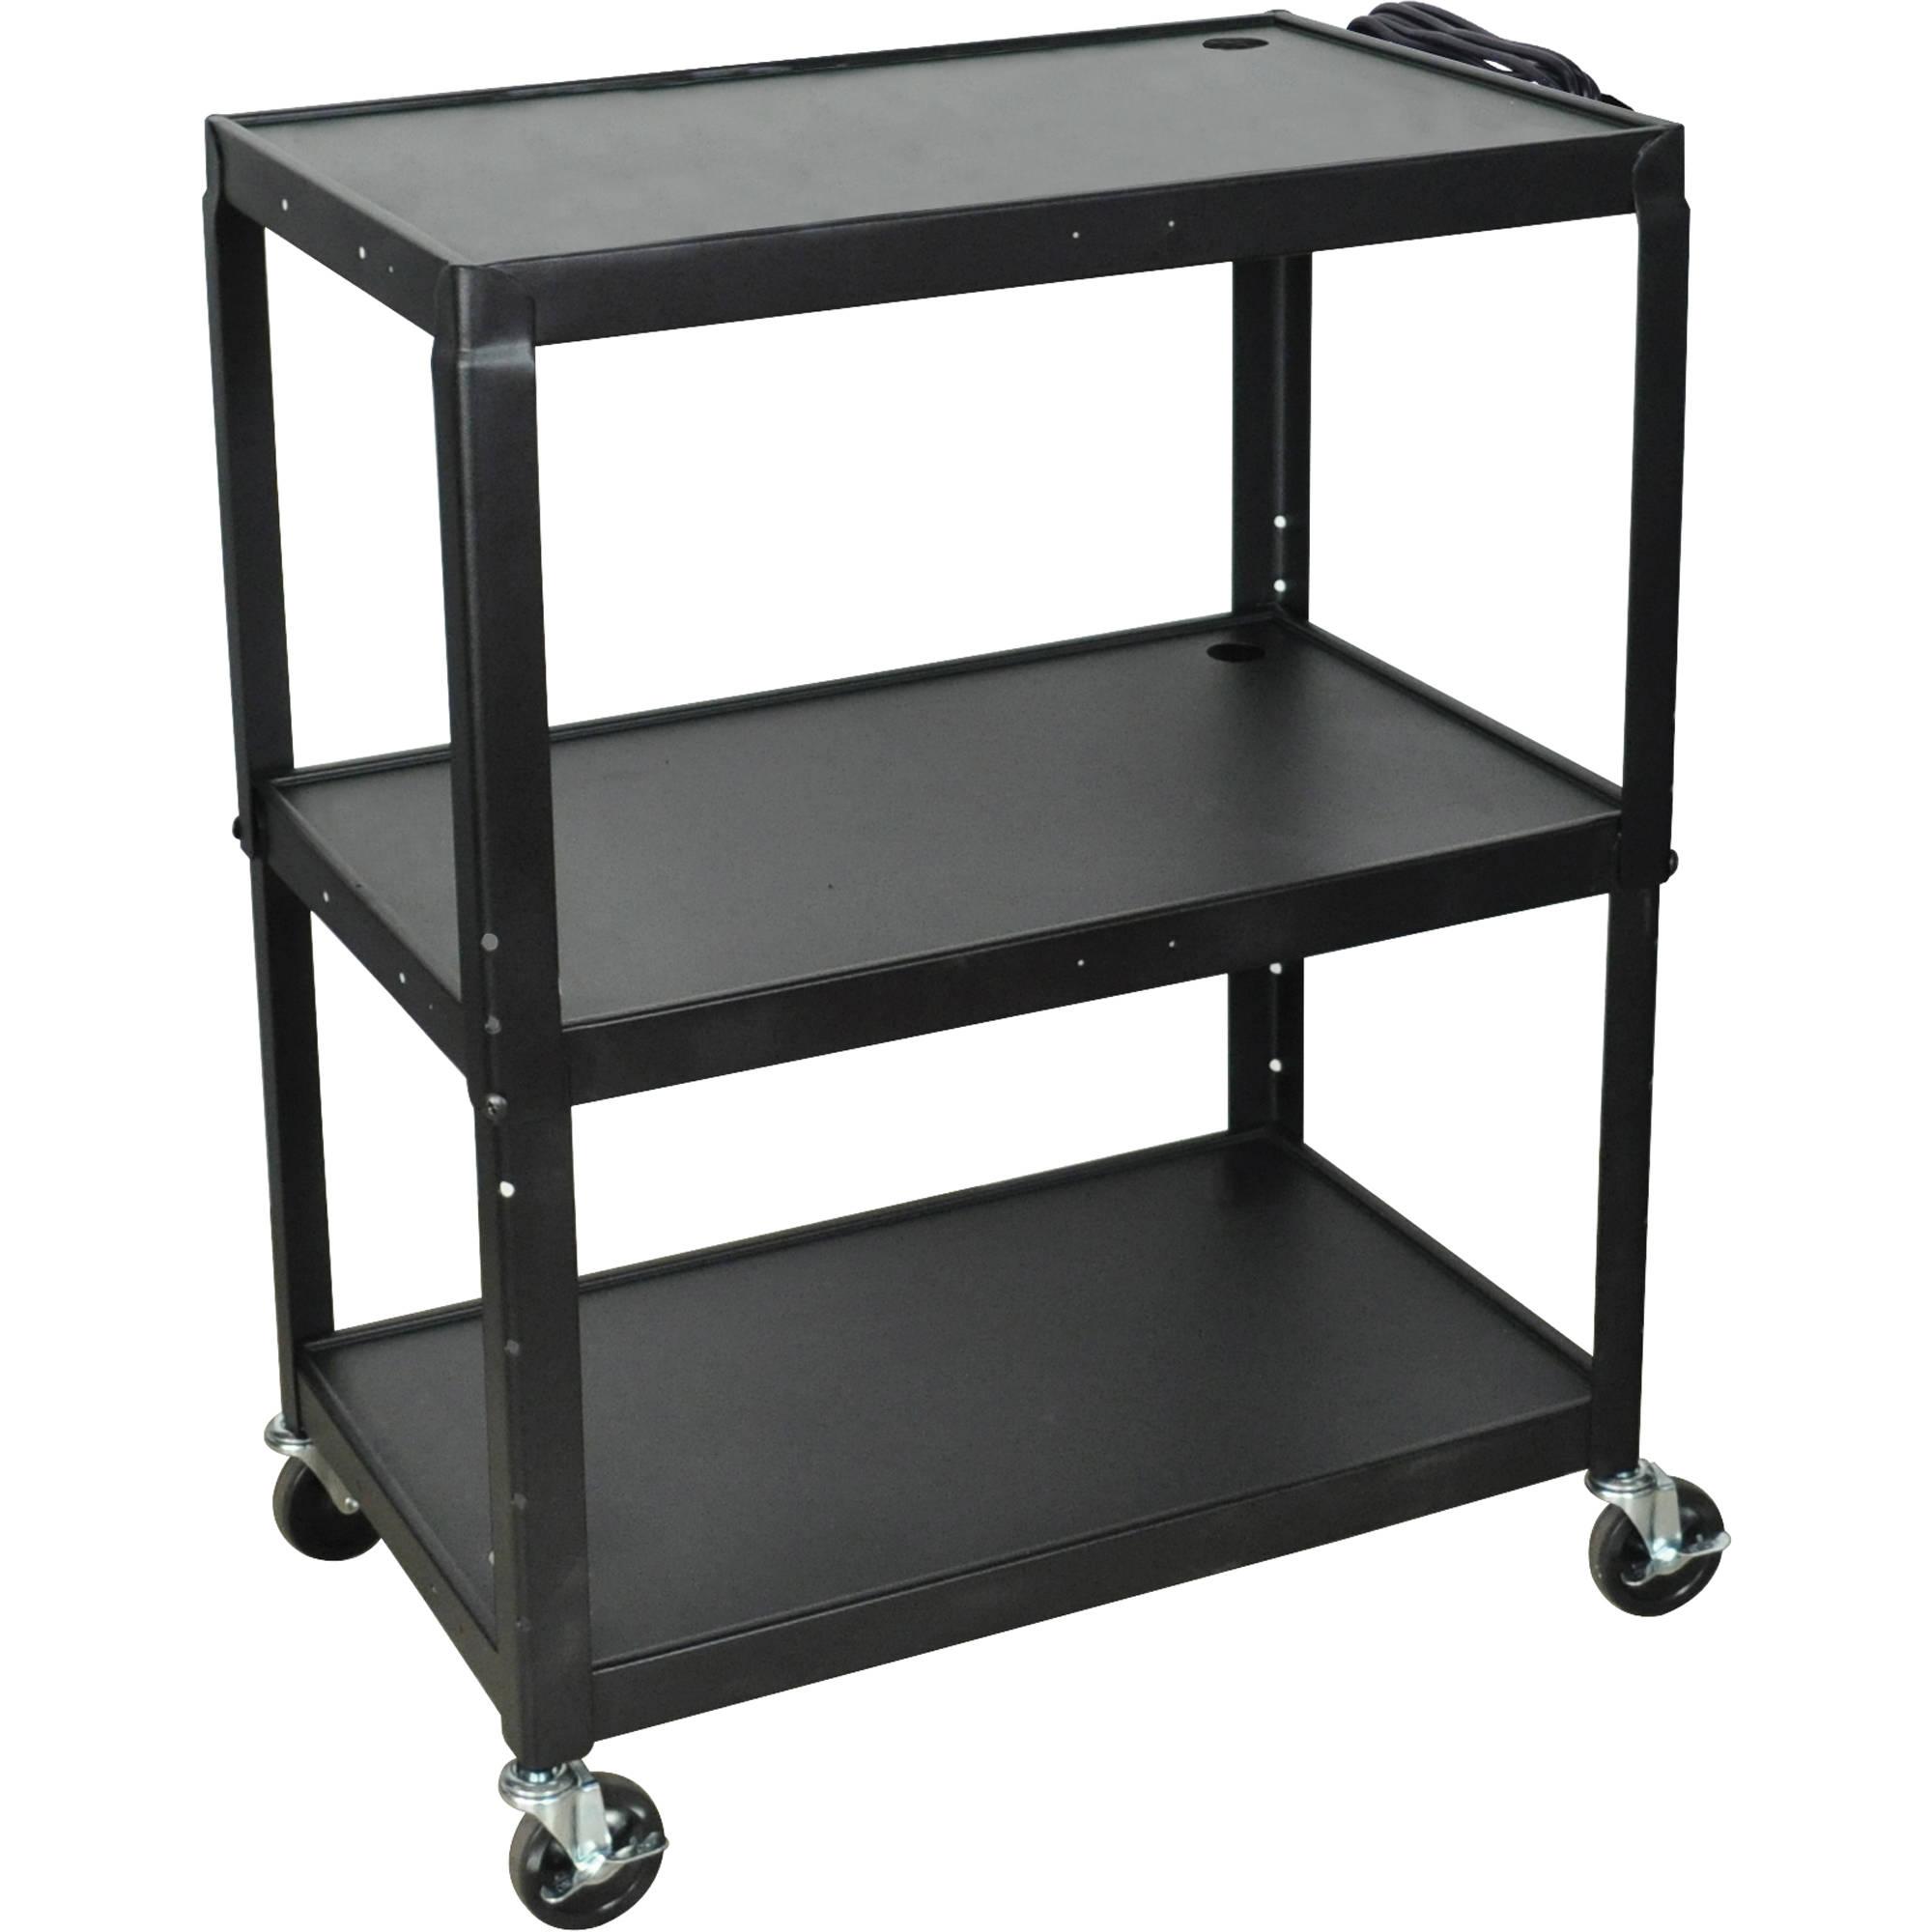 luxor avj42xl steel adjustable height extra large av cart black